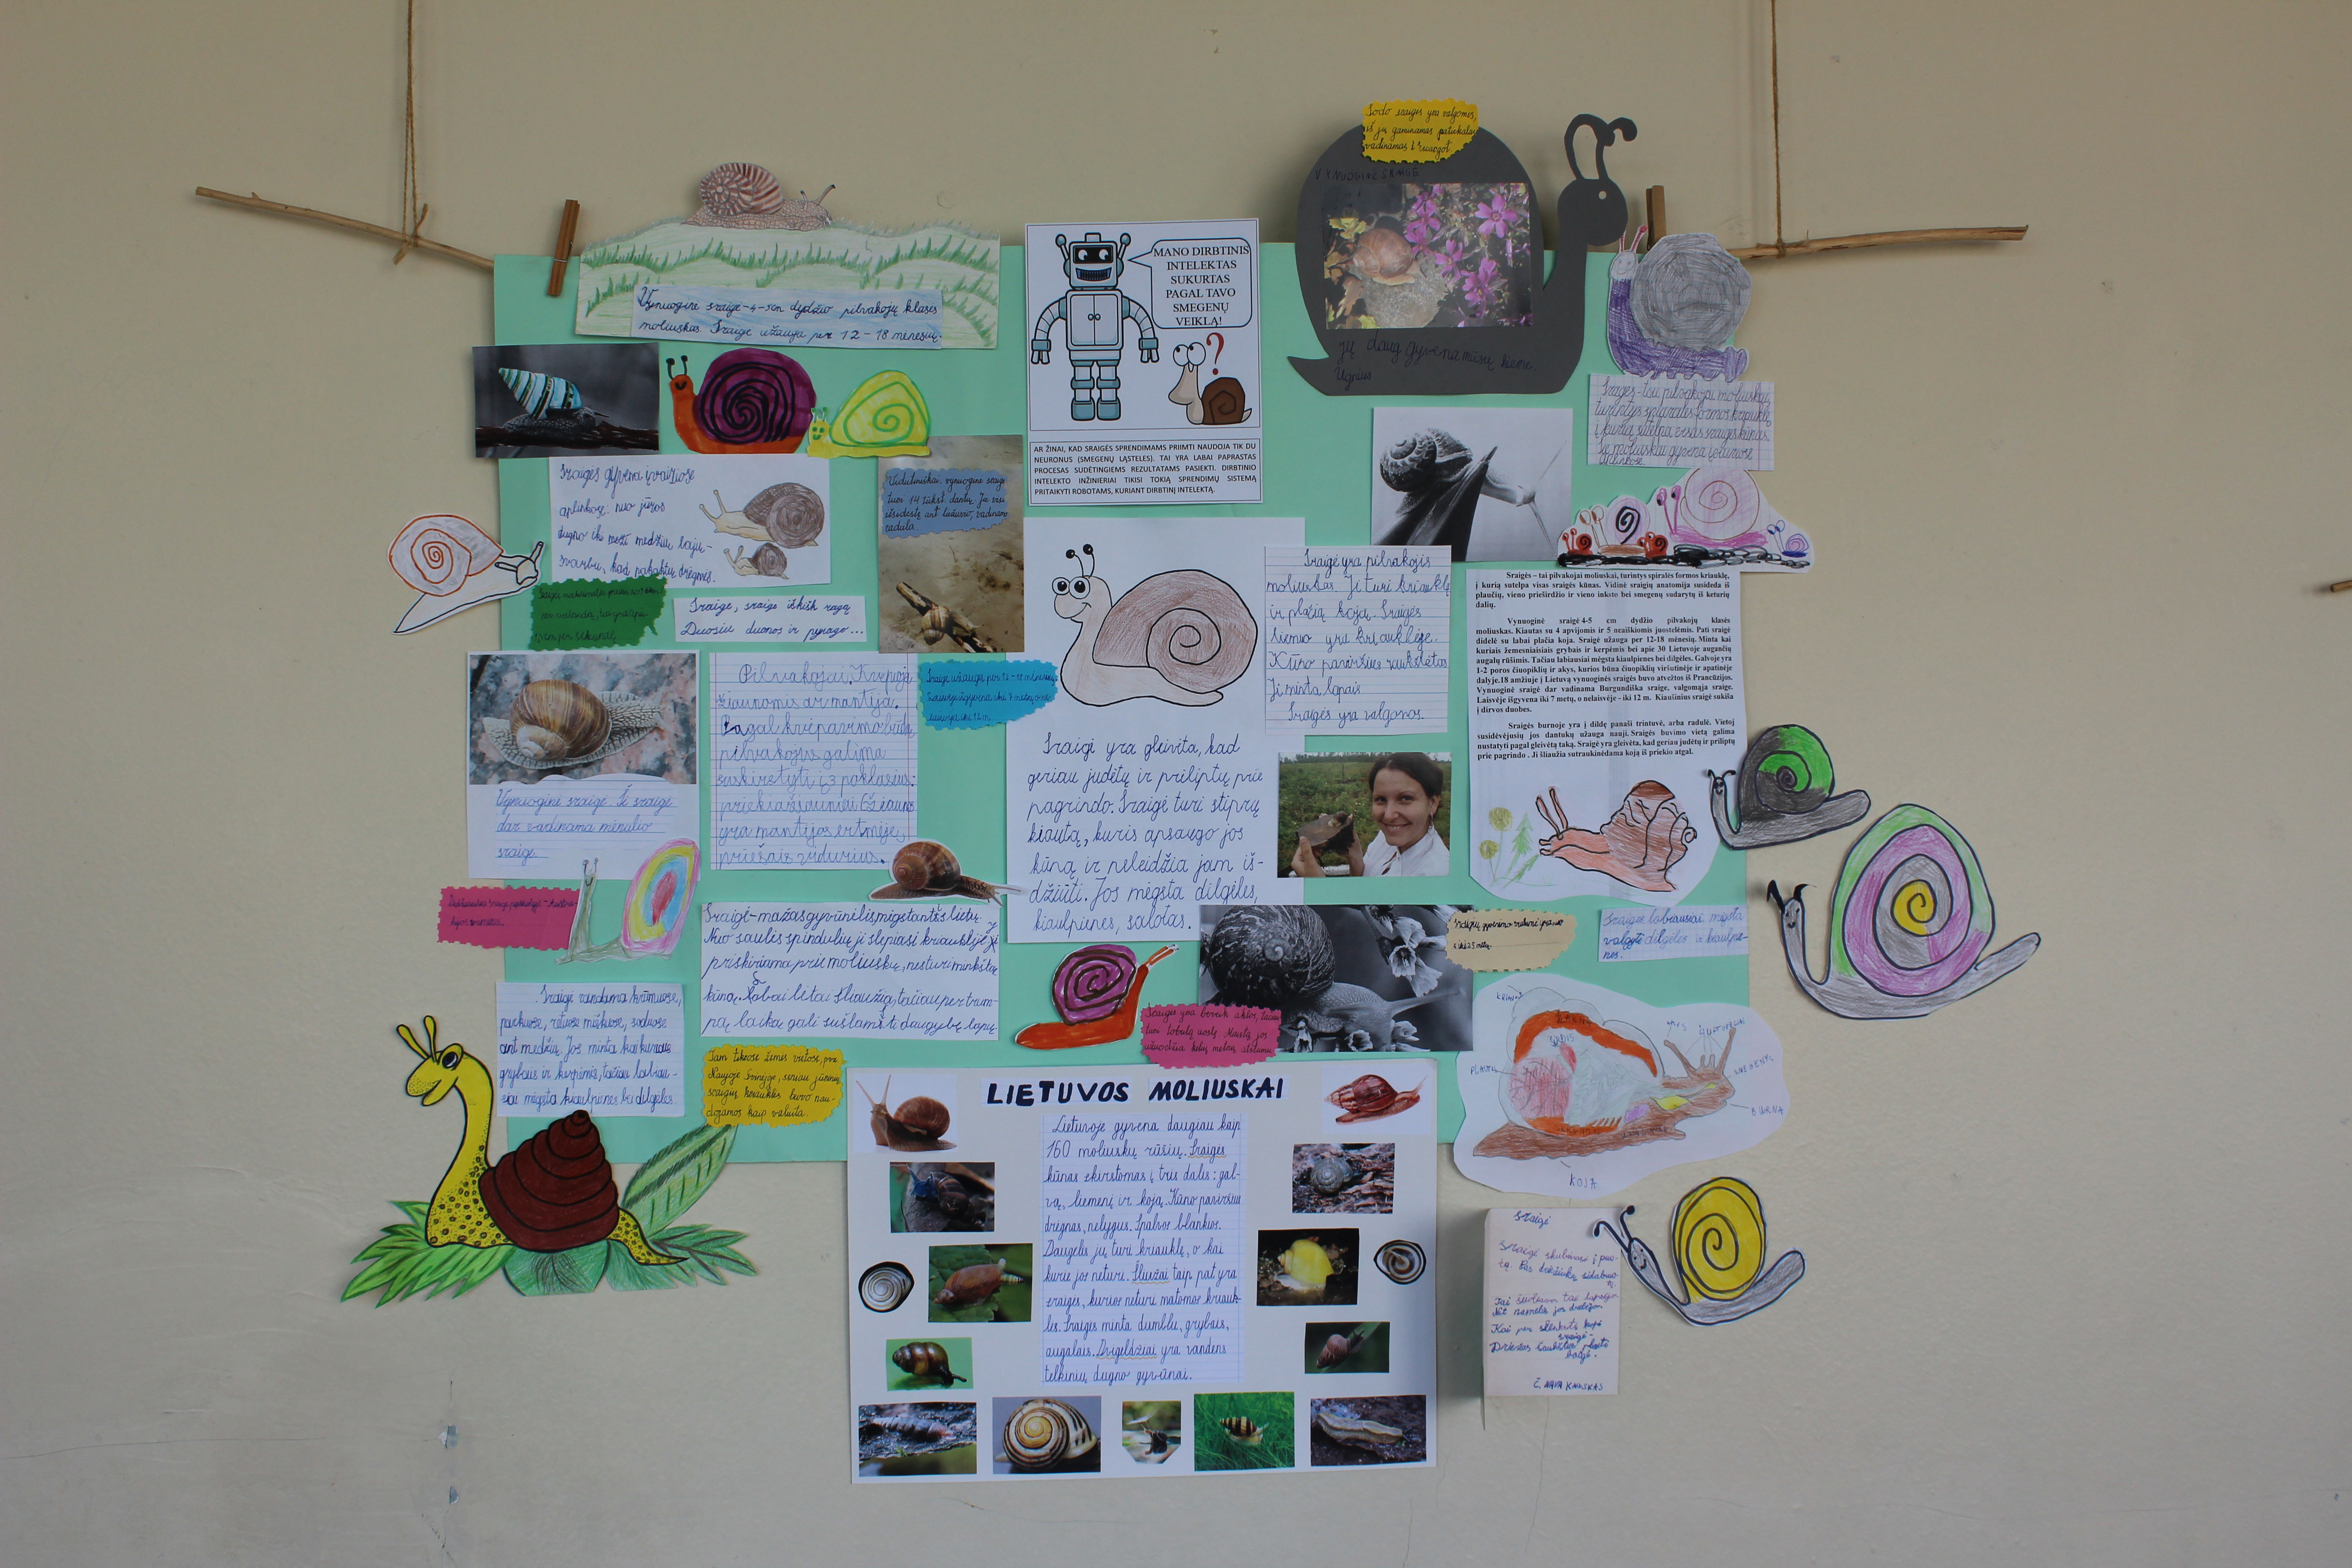 Mokslinė konferencija gimnazijoje